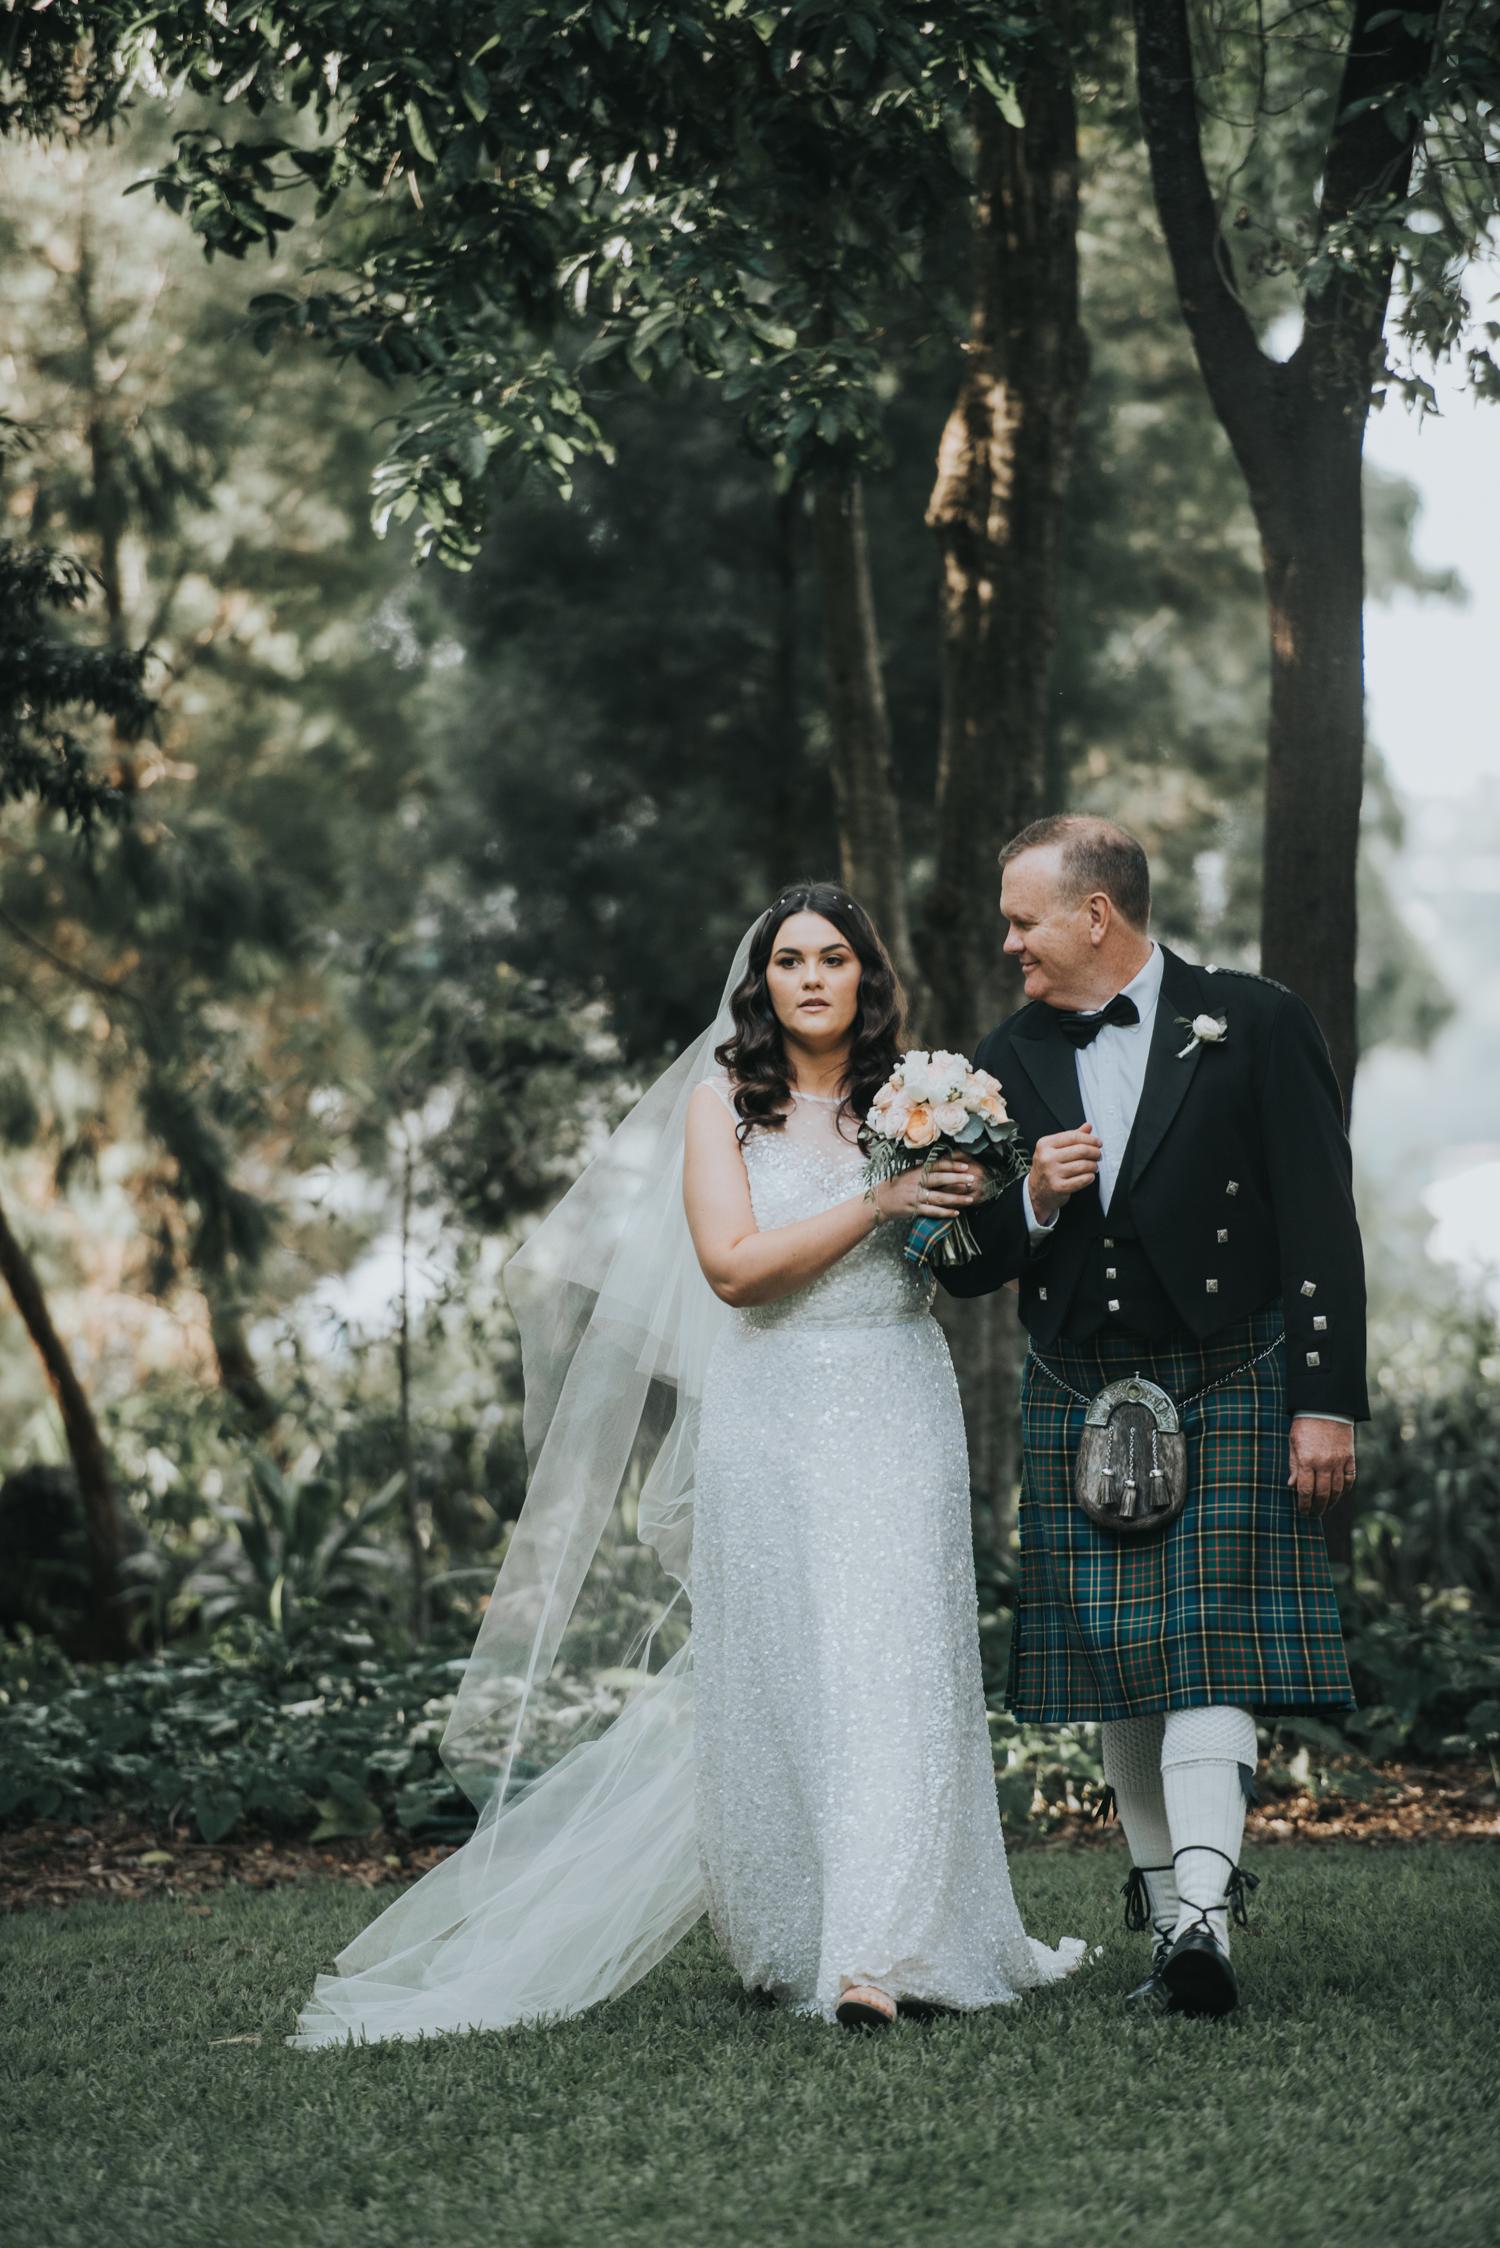 Brisbane Wedding Photographer | Beautiful intimate elopement photography-22.jpg